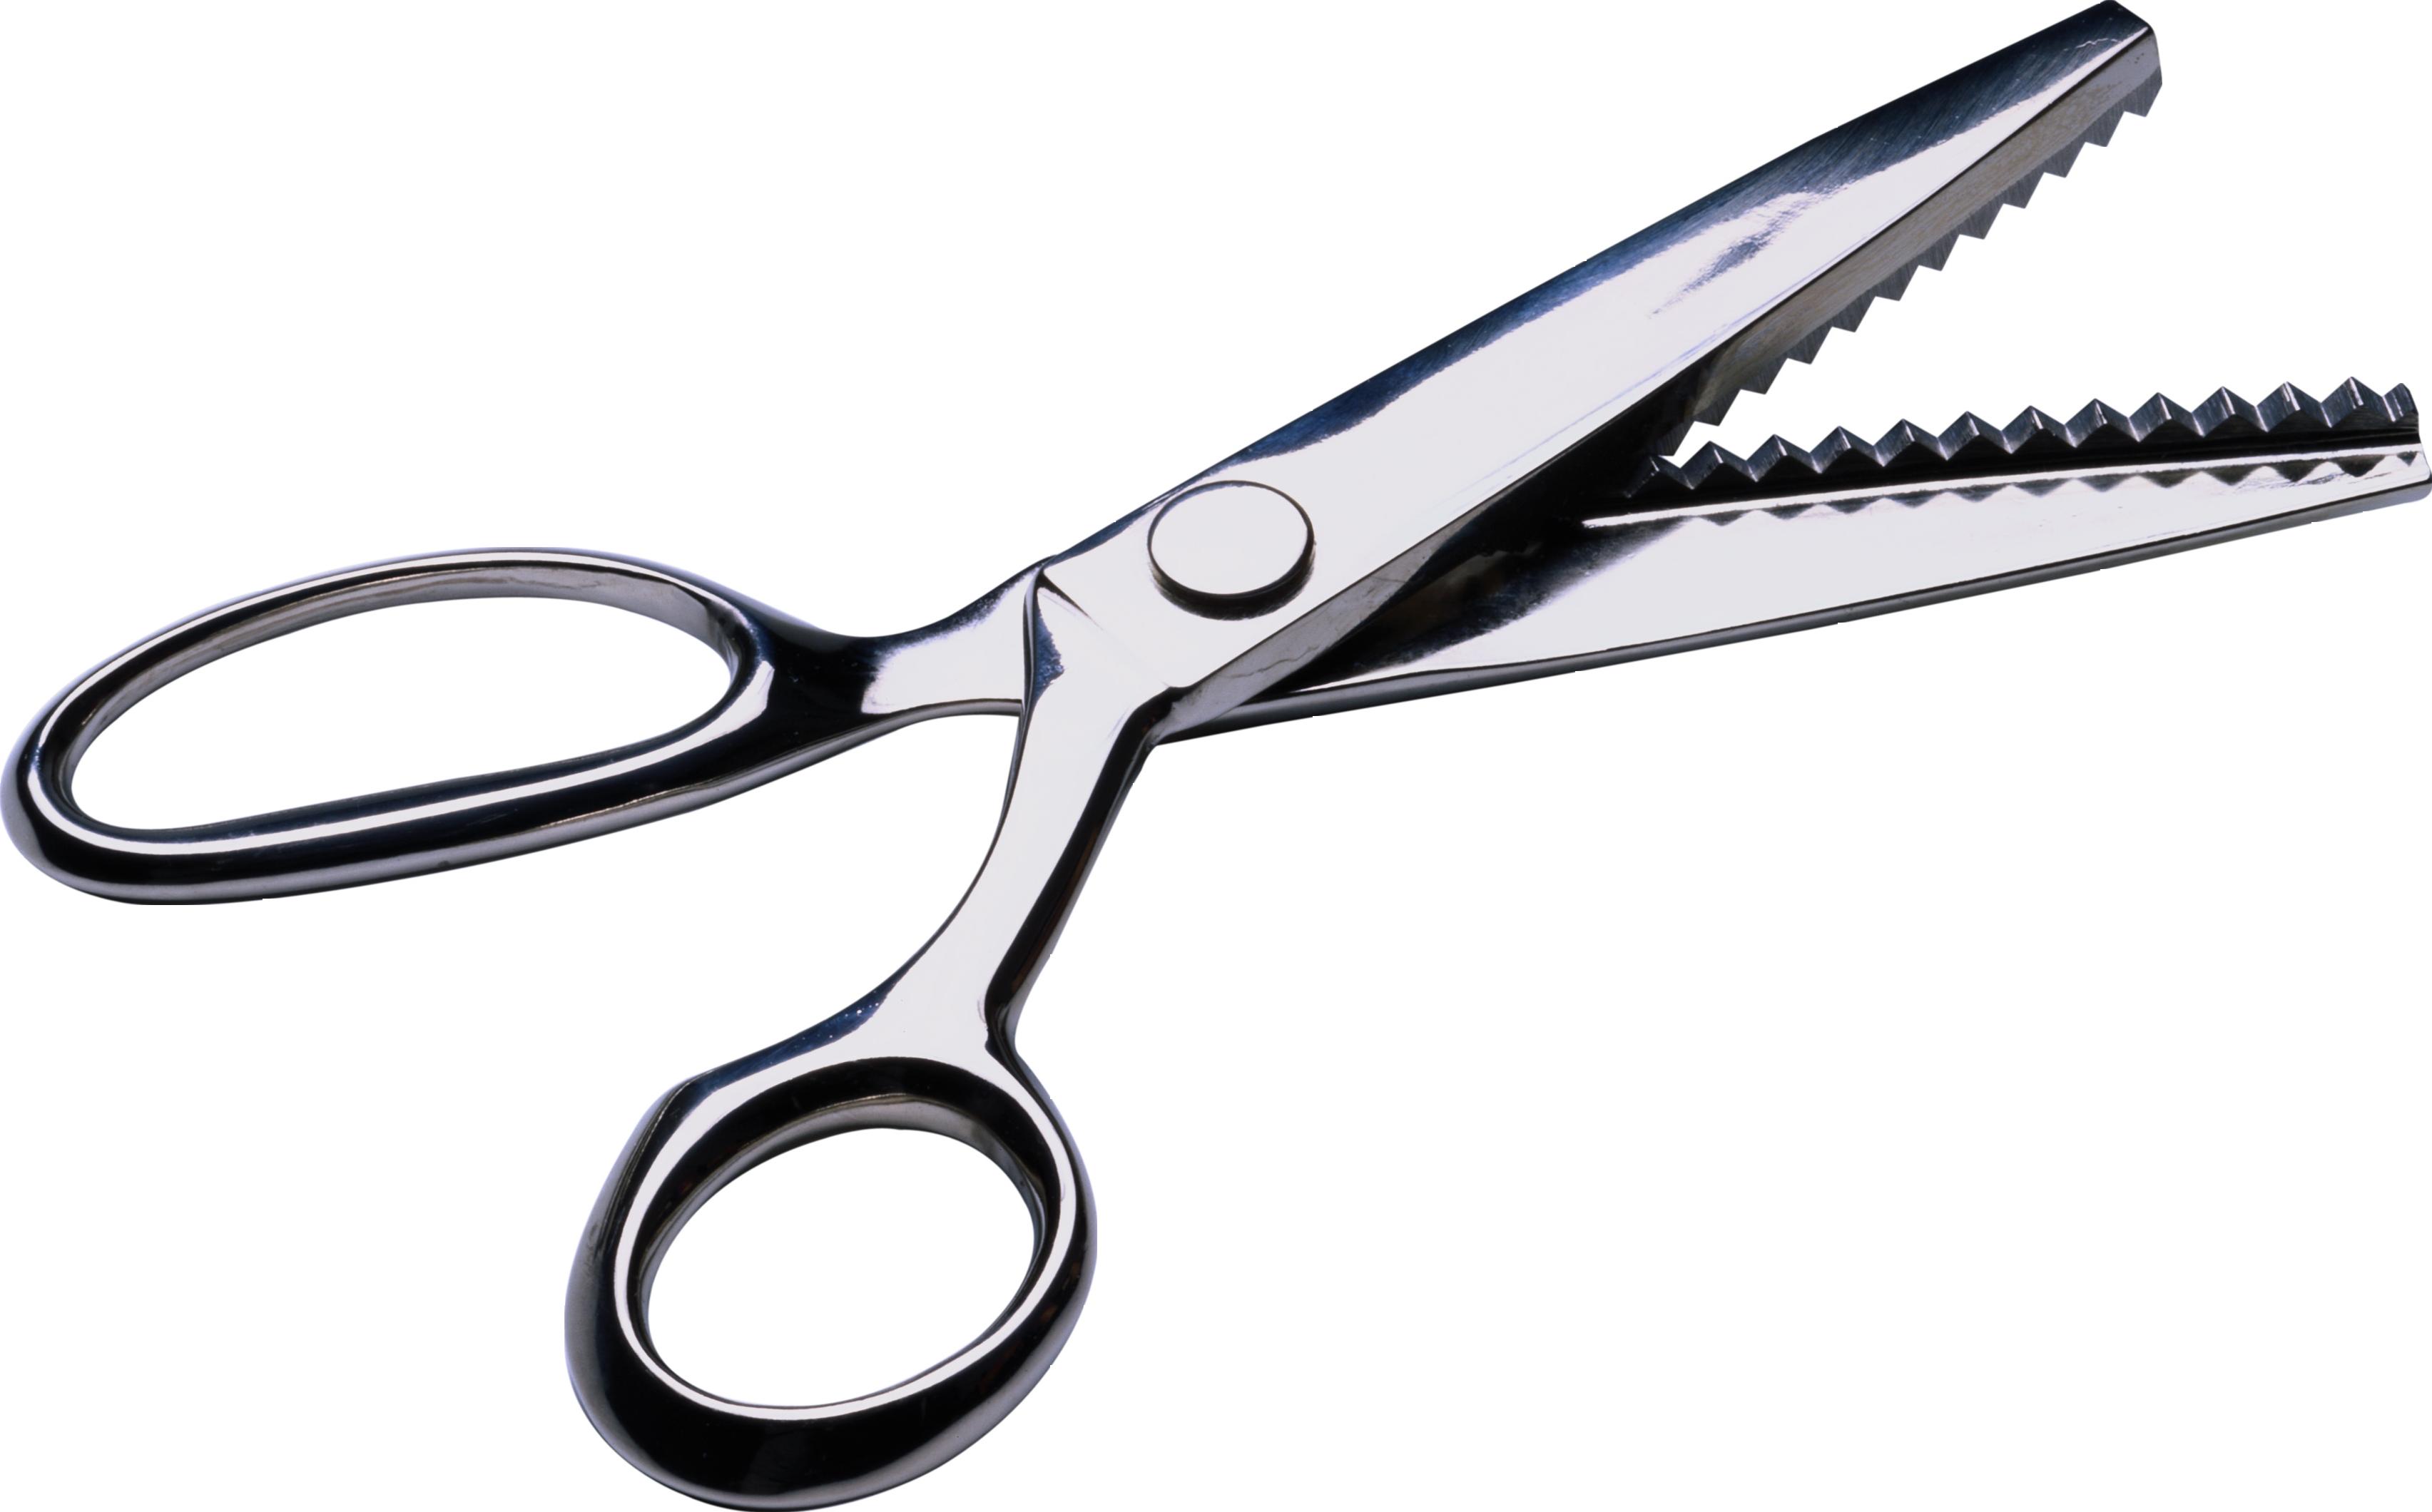 scissors PNG image - Scissor PNG